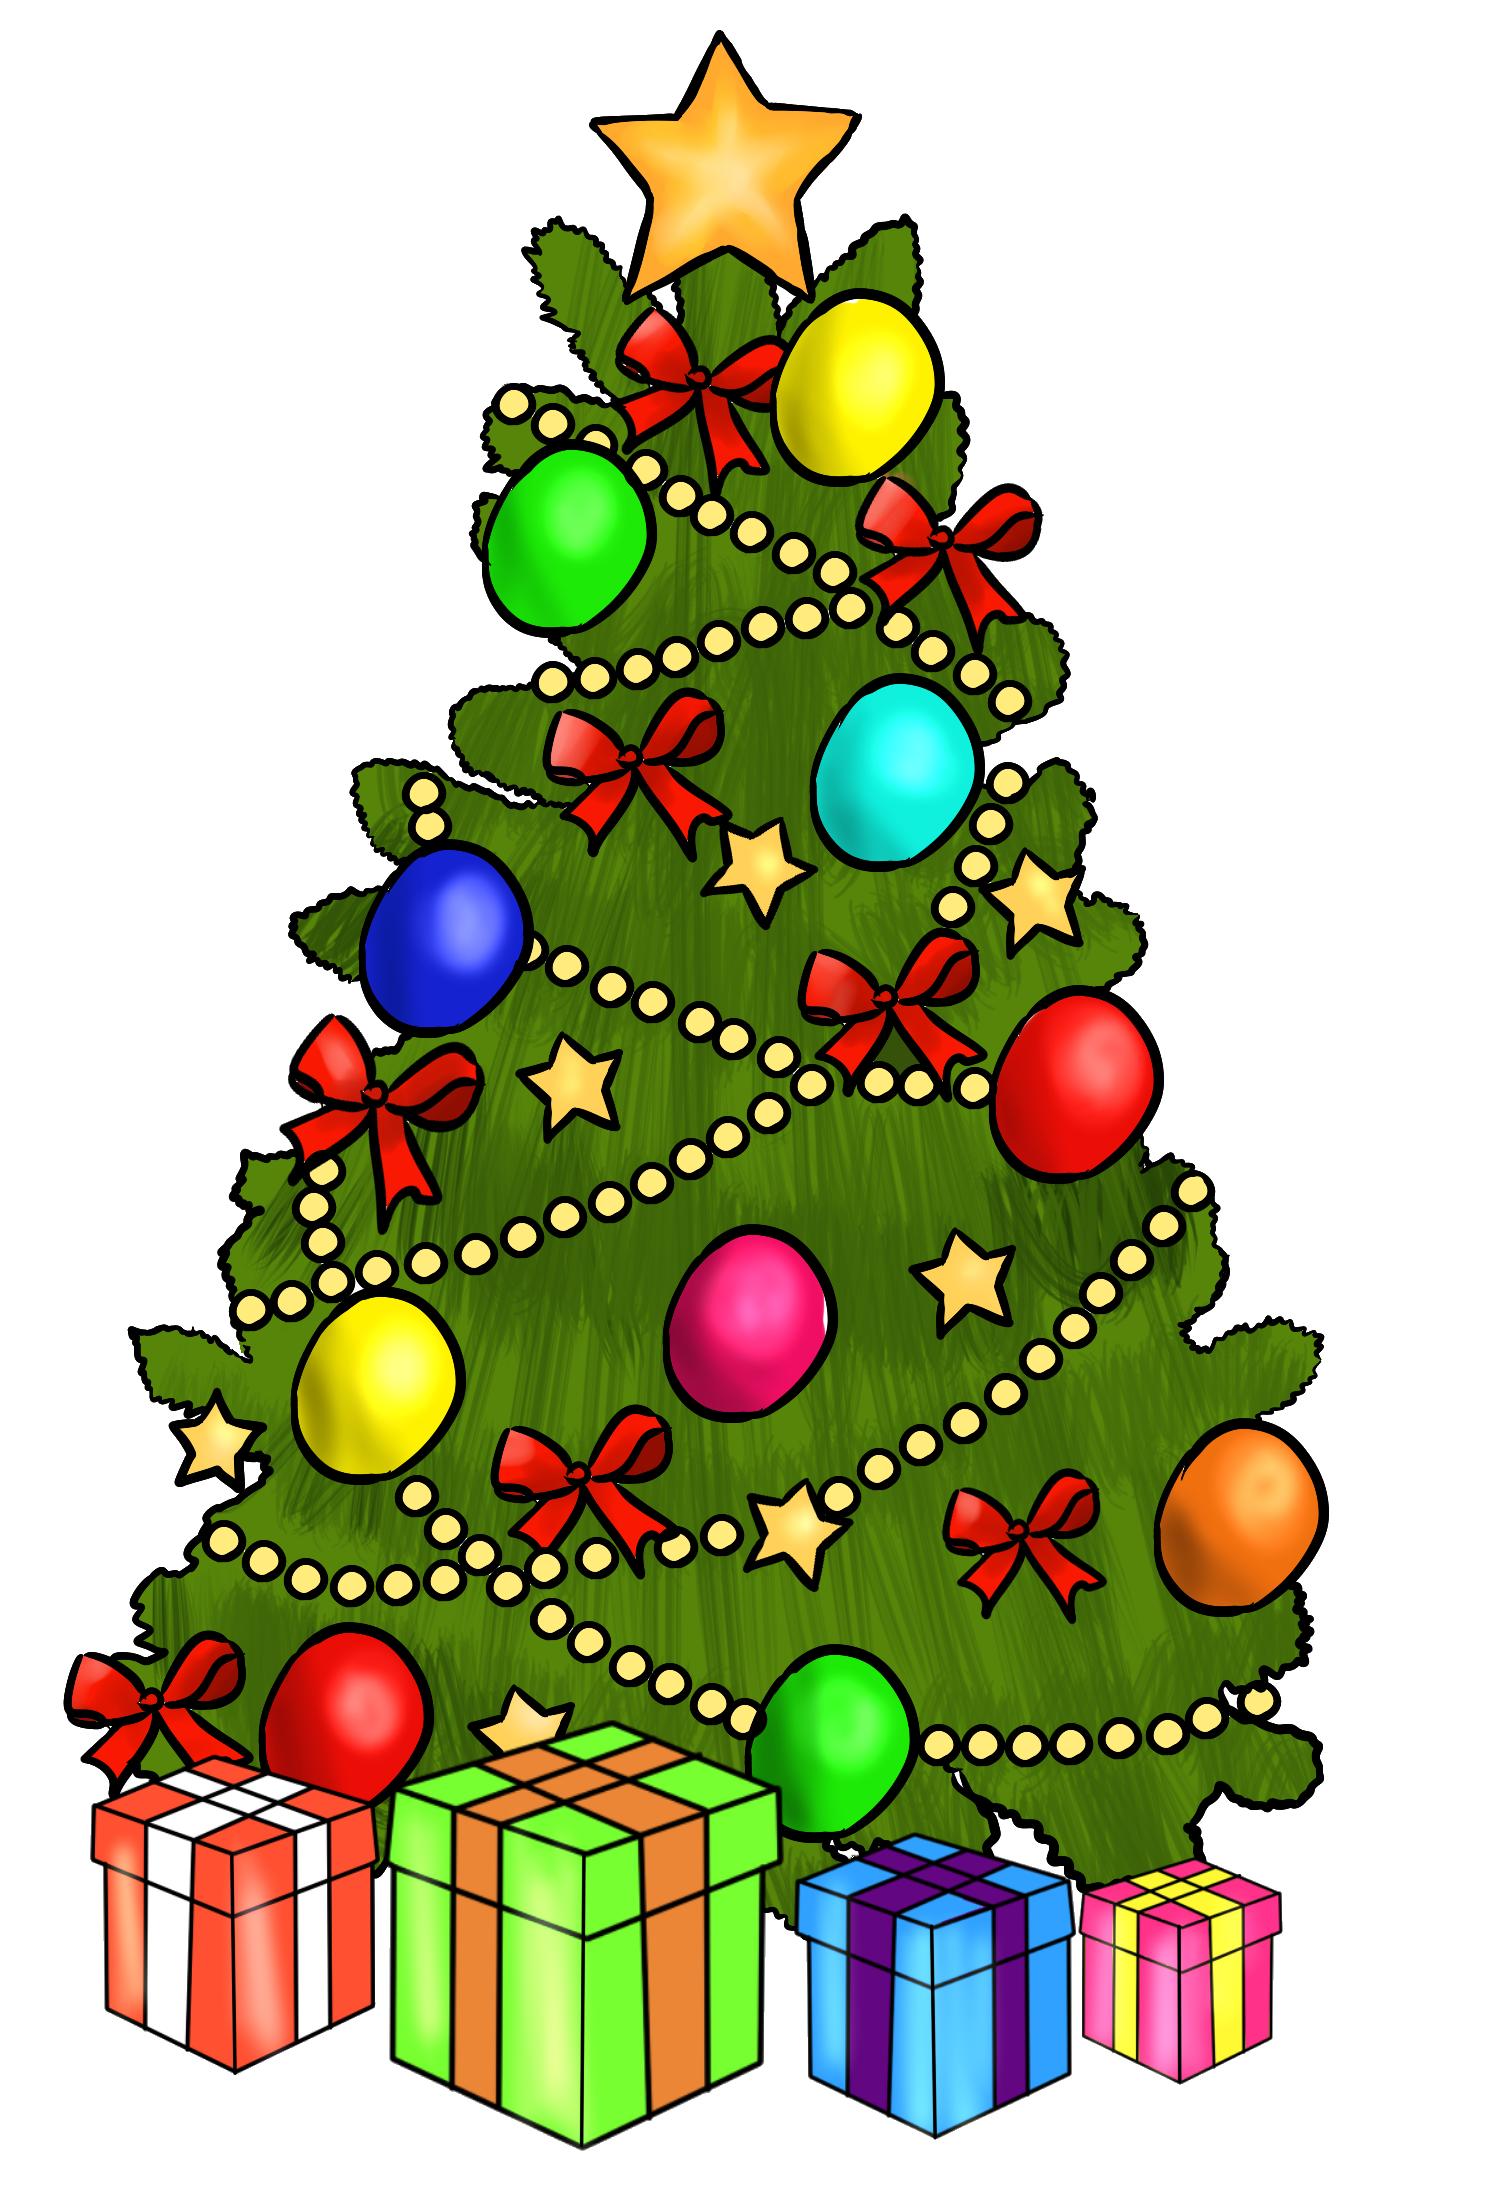 Christmas Tree Clip Art ..-Christmas Tree Clip Art ..-4